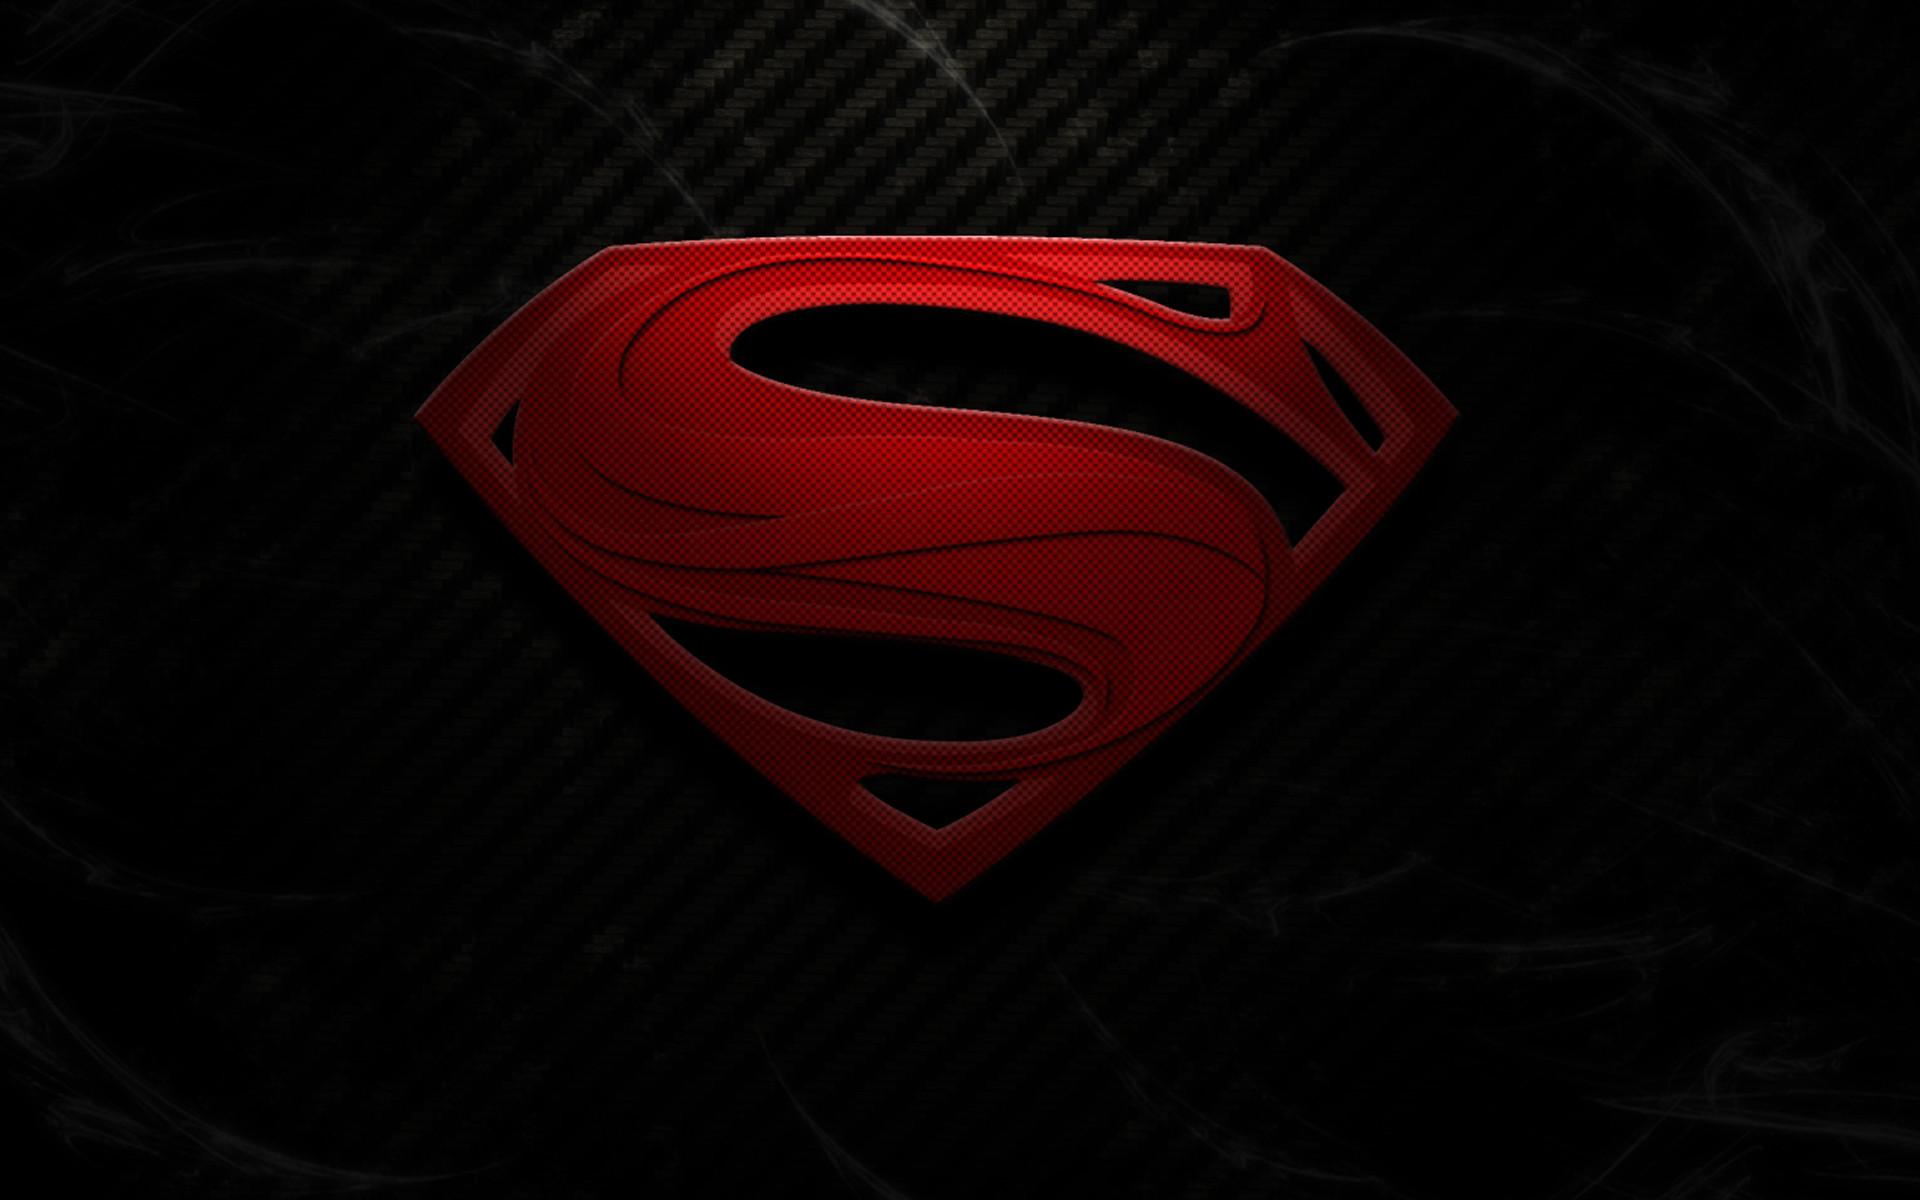 Man Of Steel logo Hope [1920x1200] pikdit 1920x1200